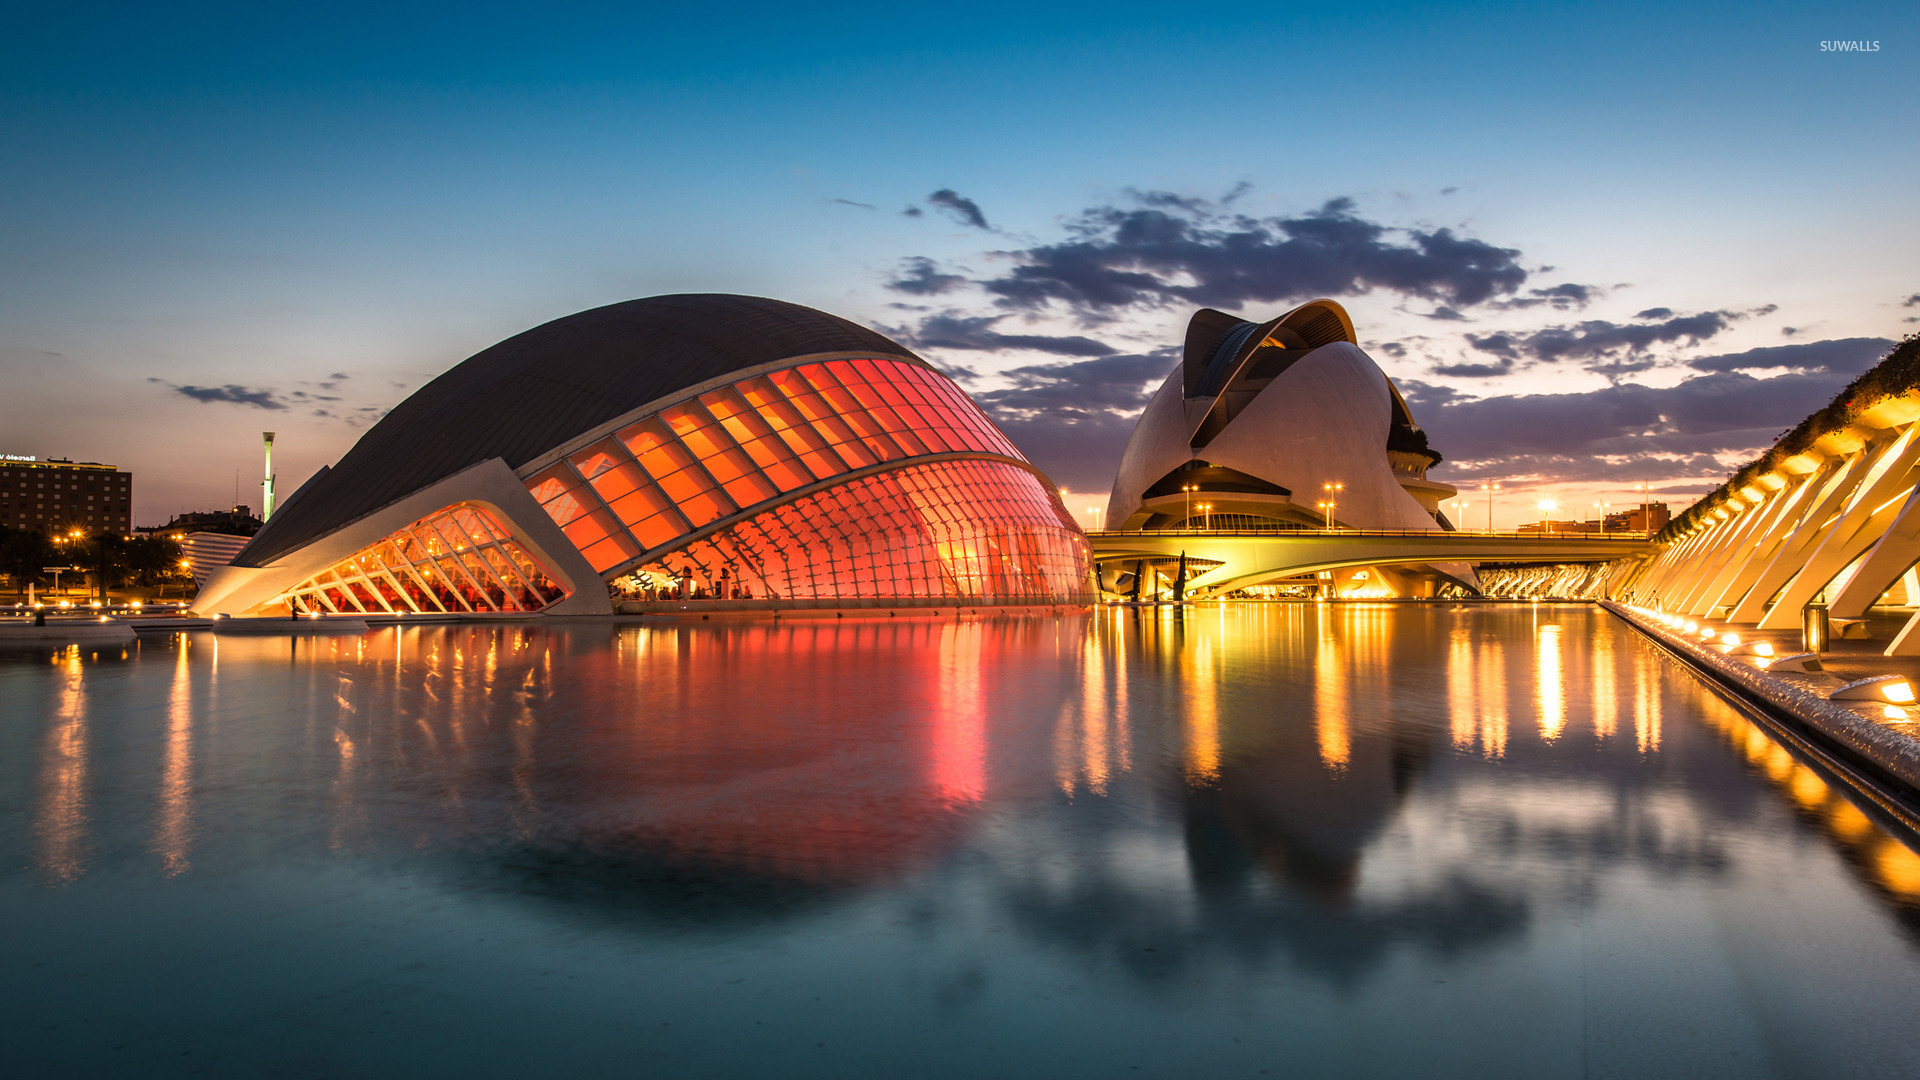 Valencia wallpaper - World wallpapers - #23371